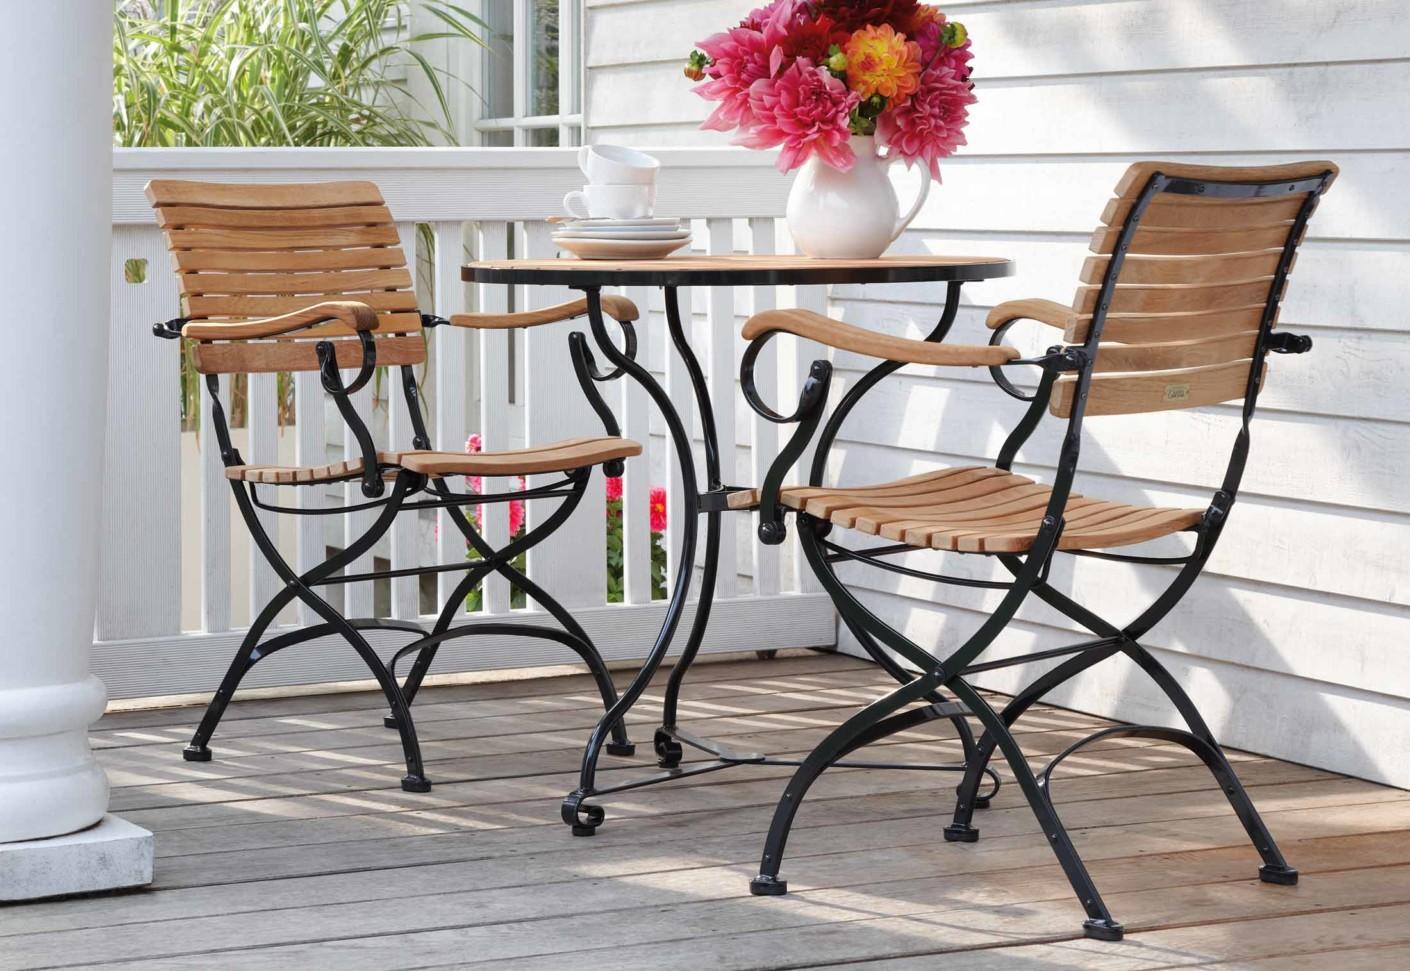 fontenay armlehnstuhl von garpa stylepark. Black Bedroom Furniture Sets. Home Design Ideas